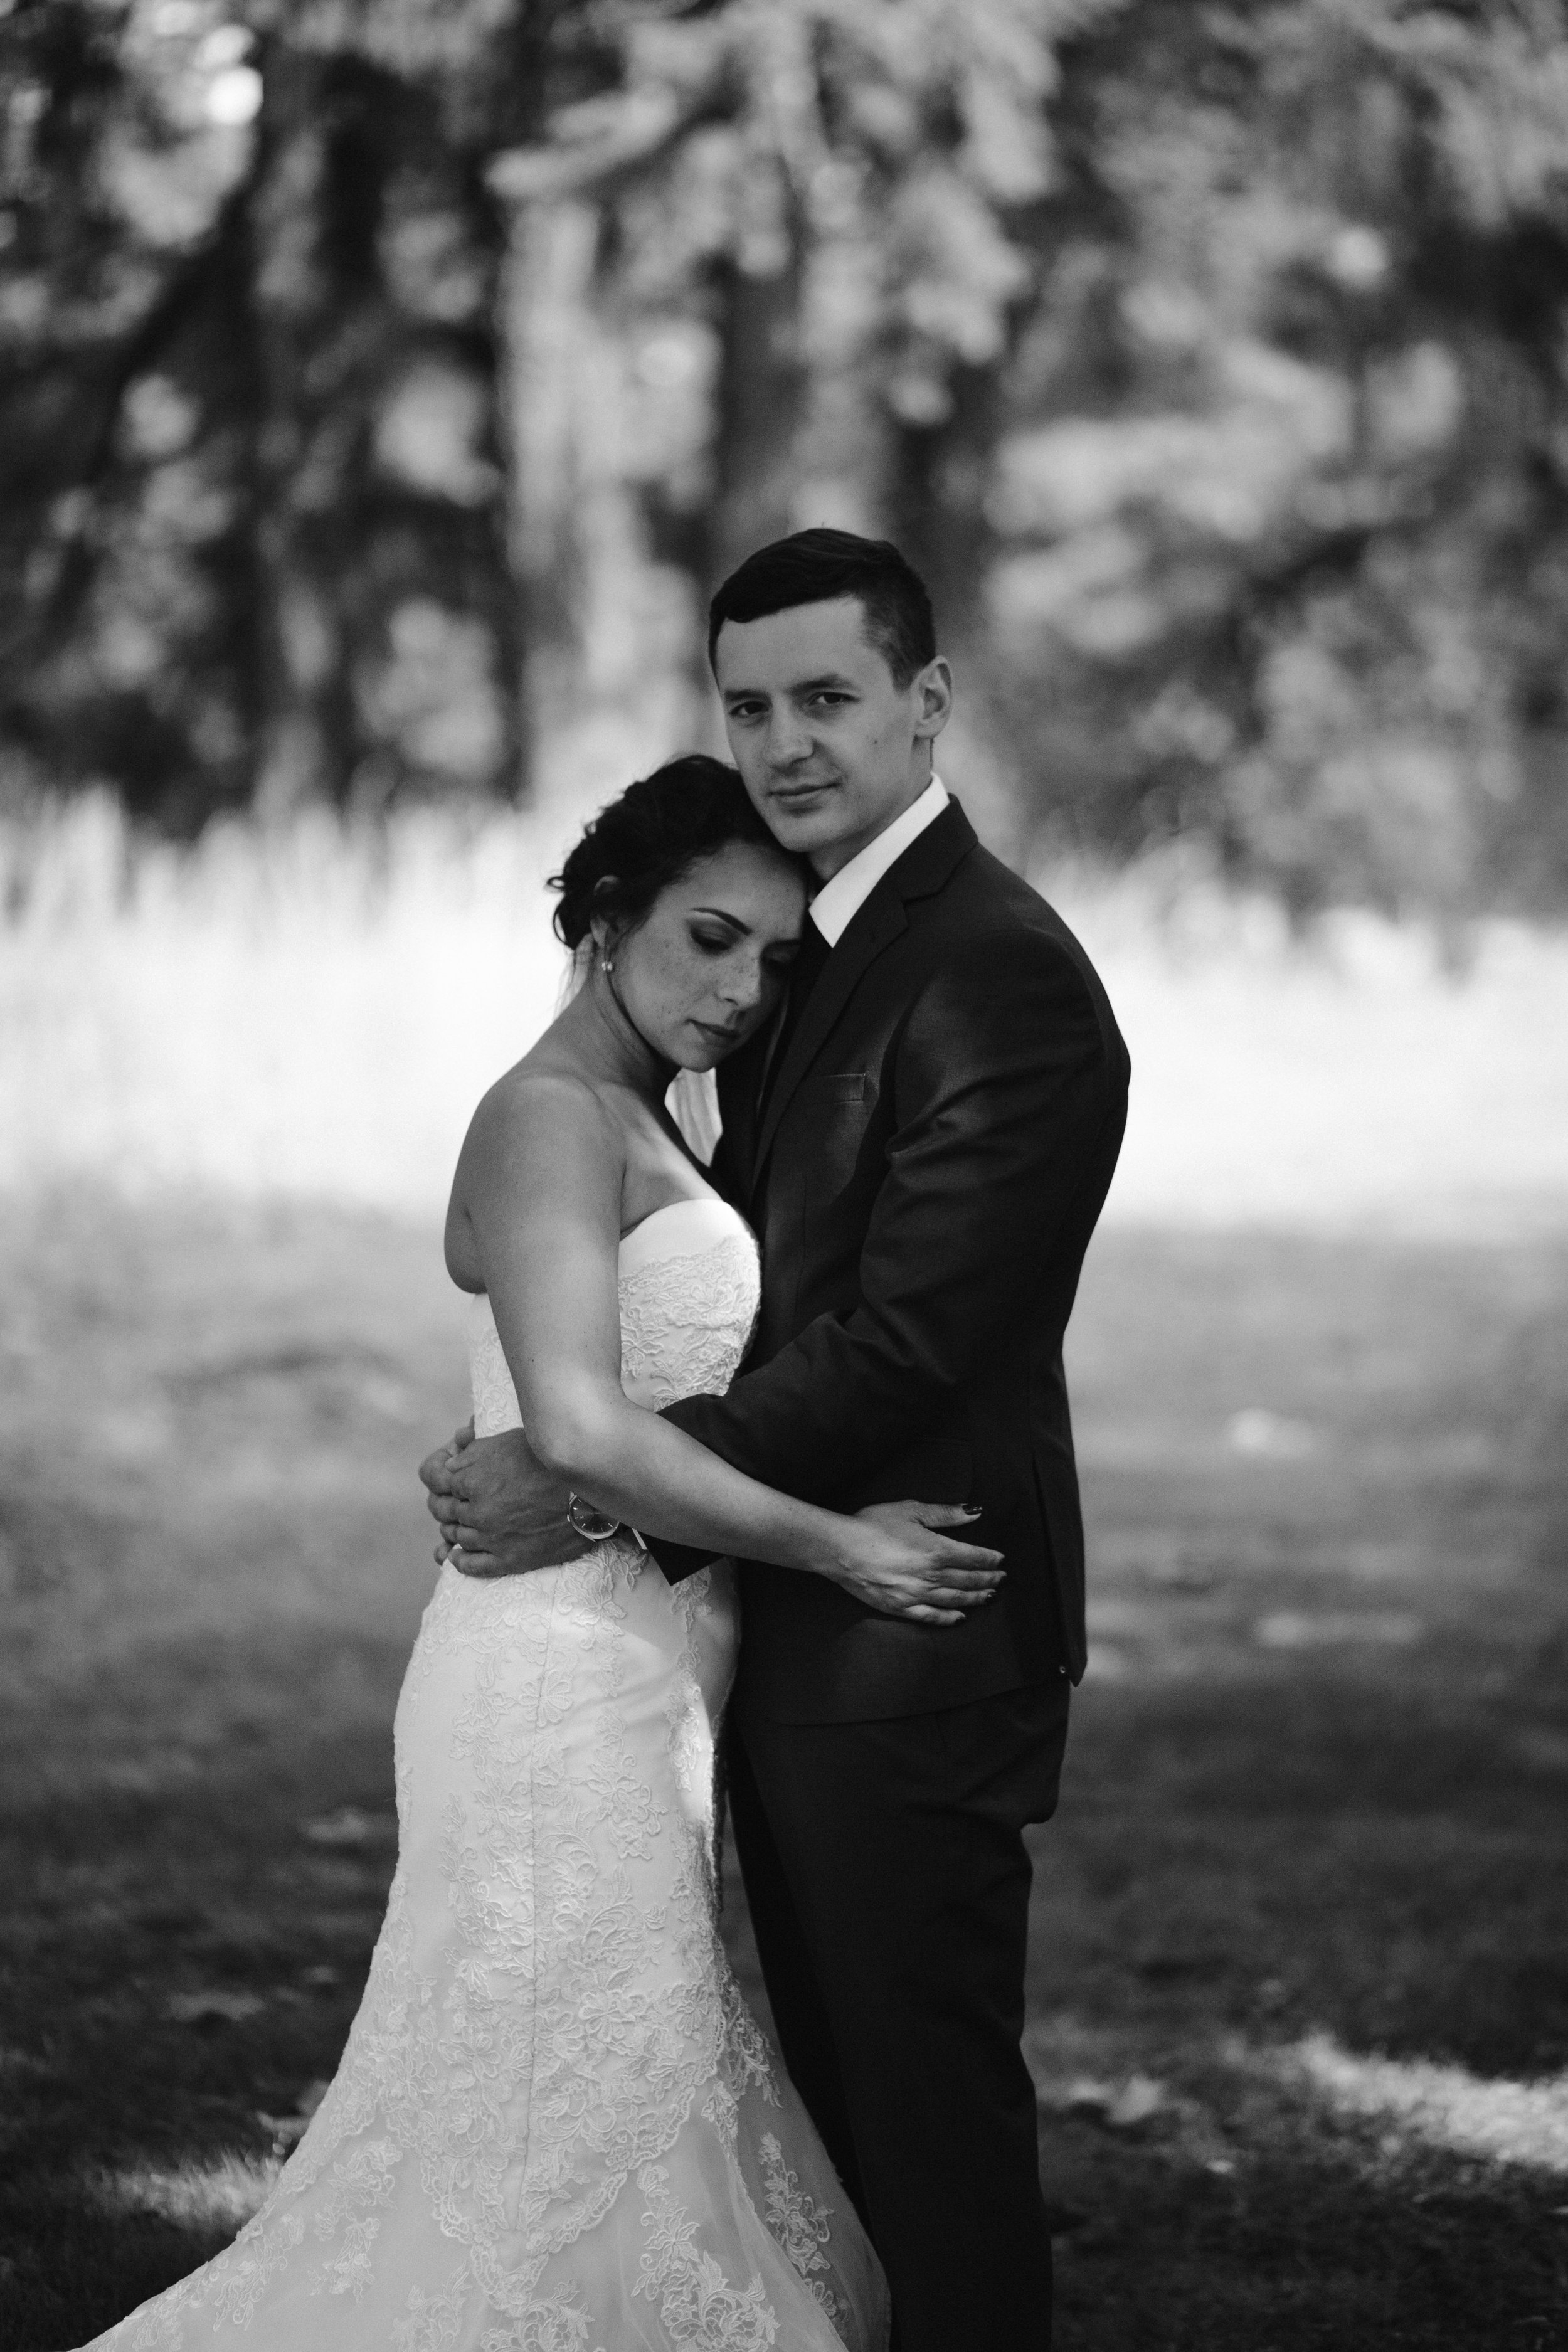 portlandoregonwedding-9813.jpg